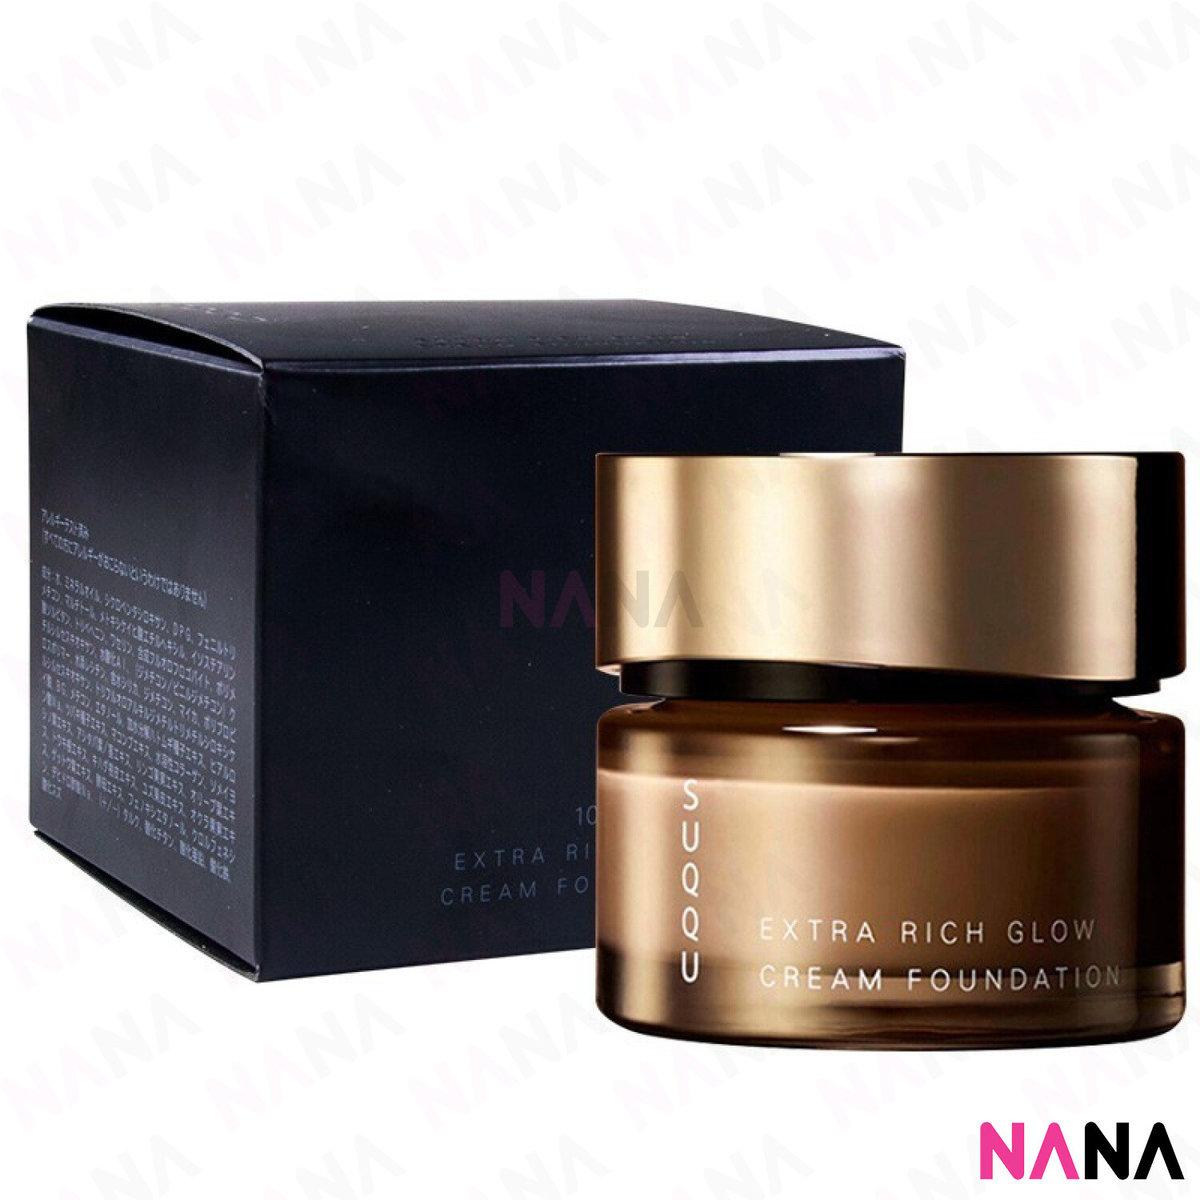 Extra Rich Glow Cream Foundation 002 30g